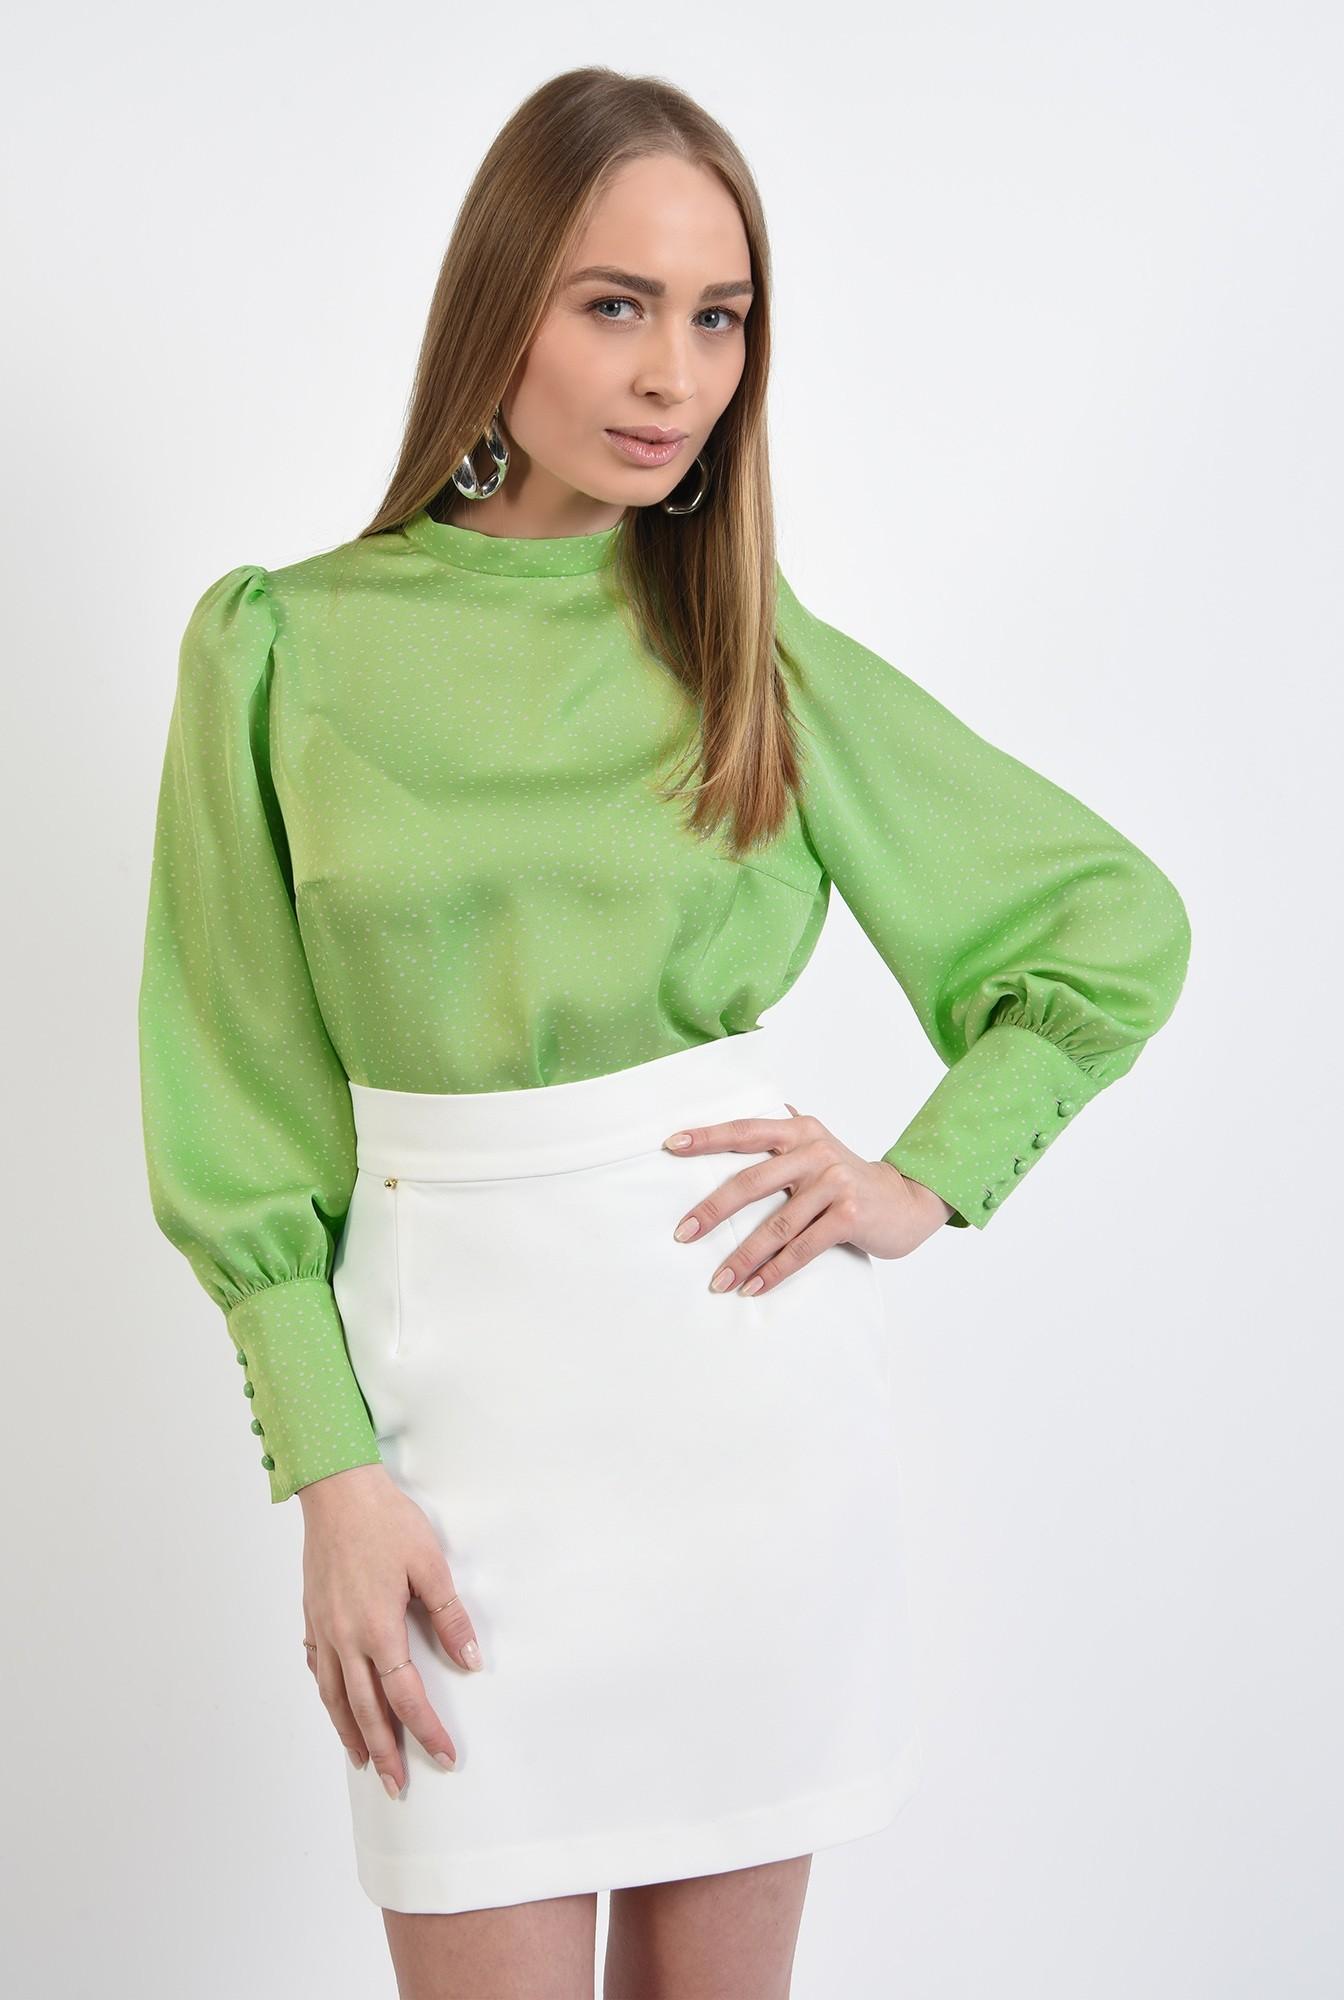 0 - bluza casual, cu buline, maneci bufante, bluza de primavara